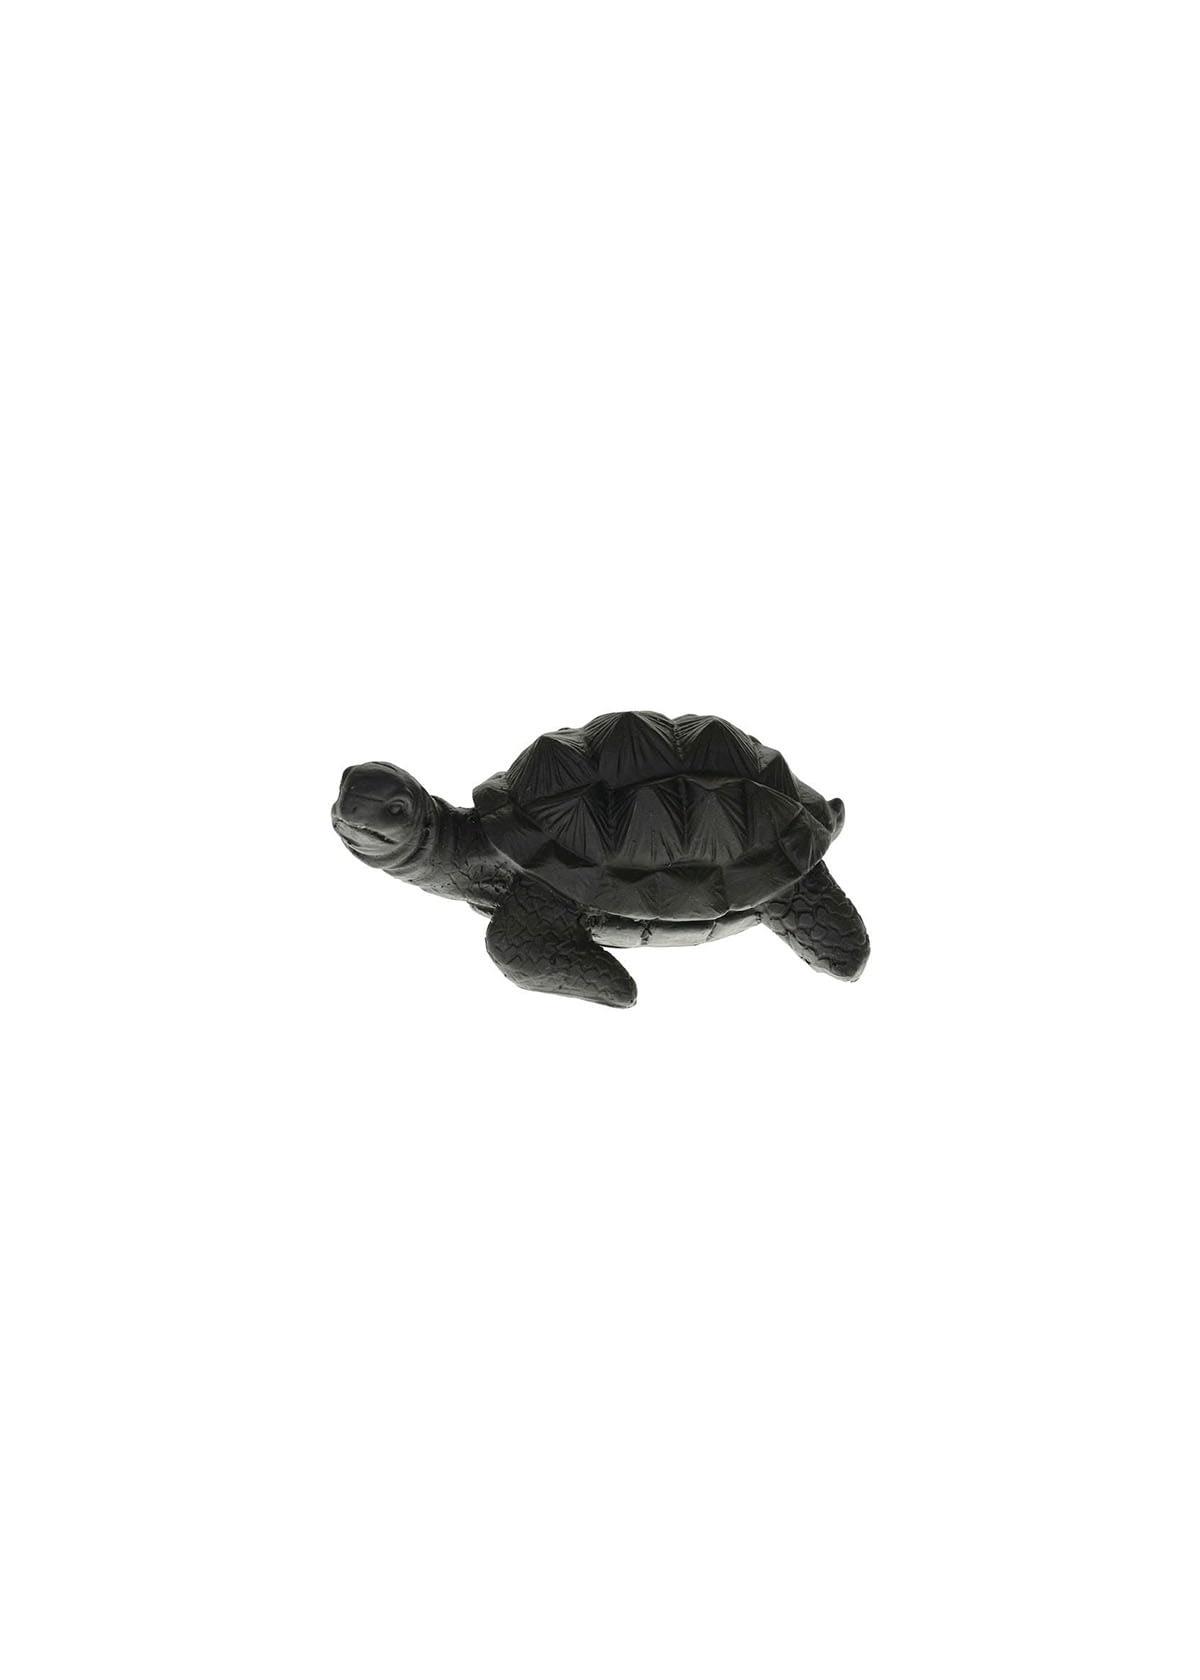 Ornament schildpad S